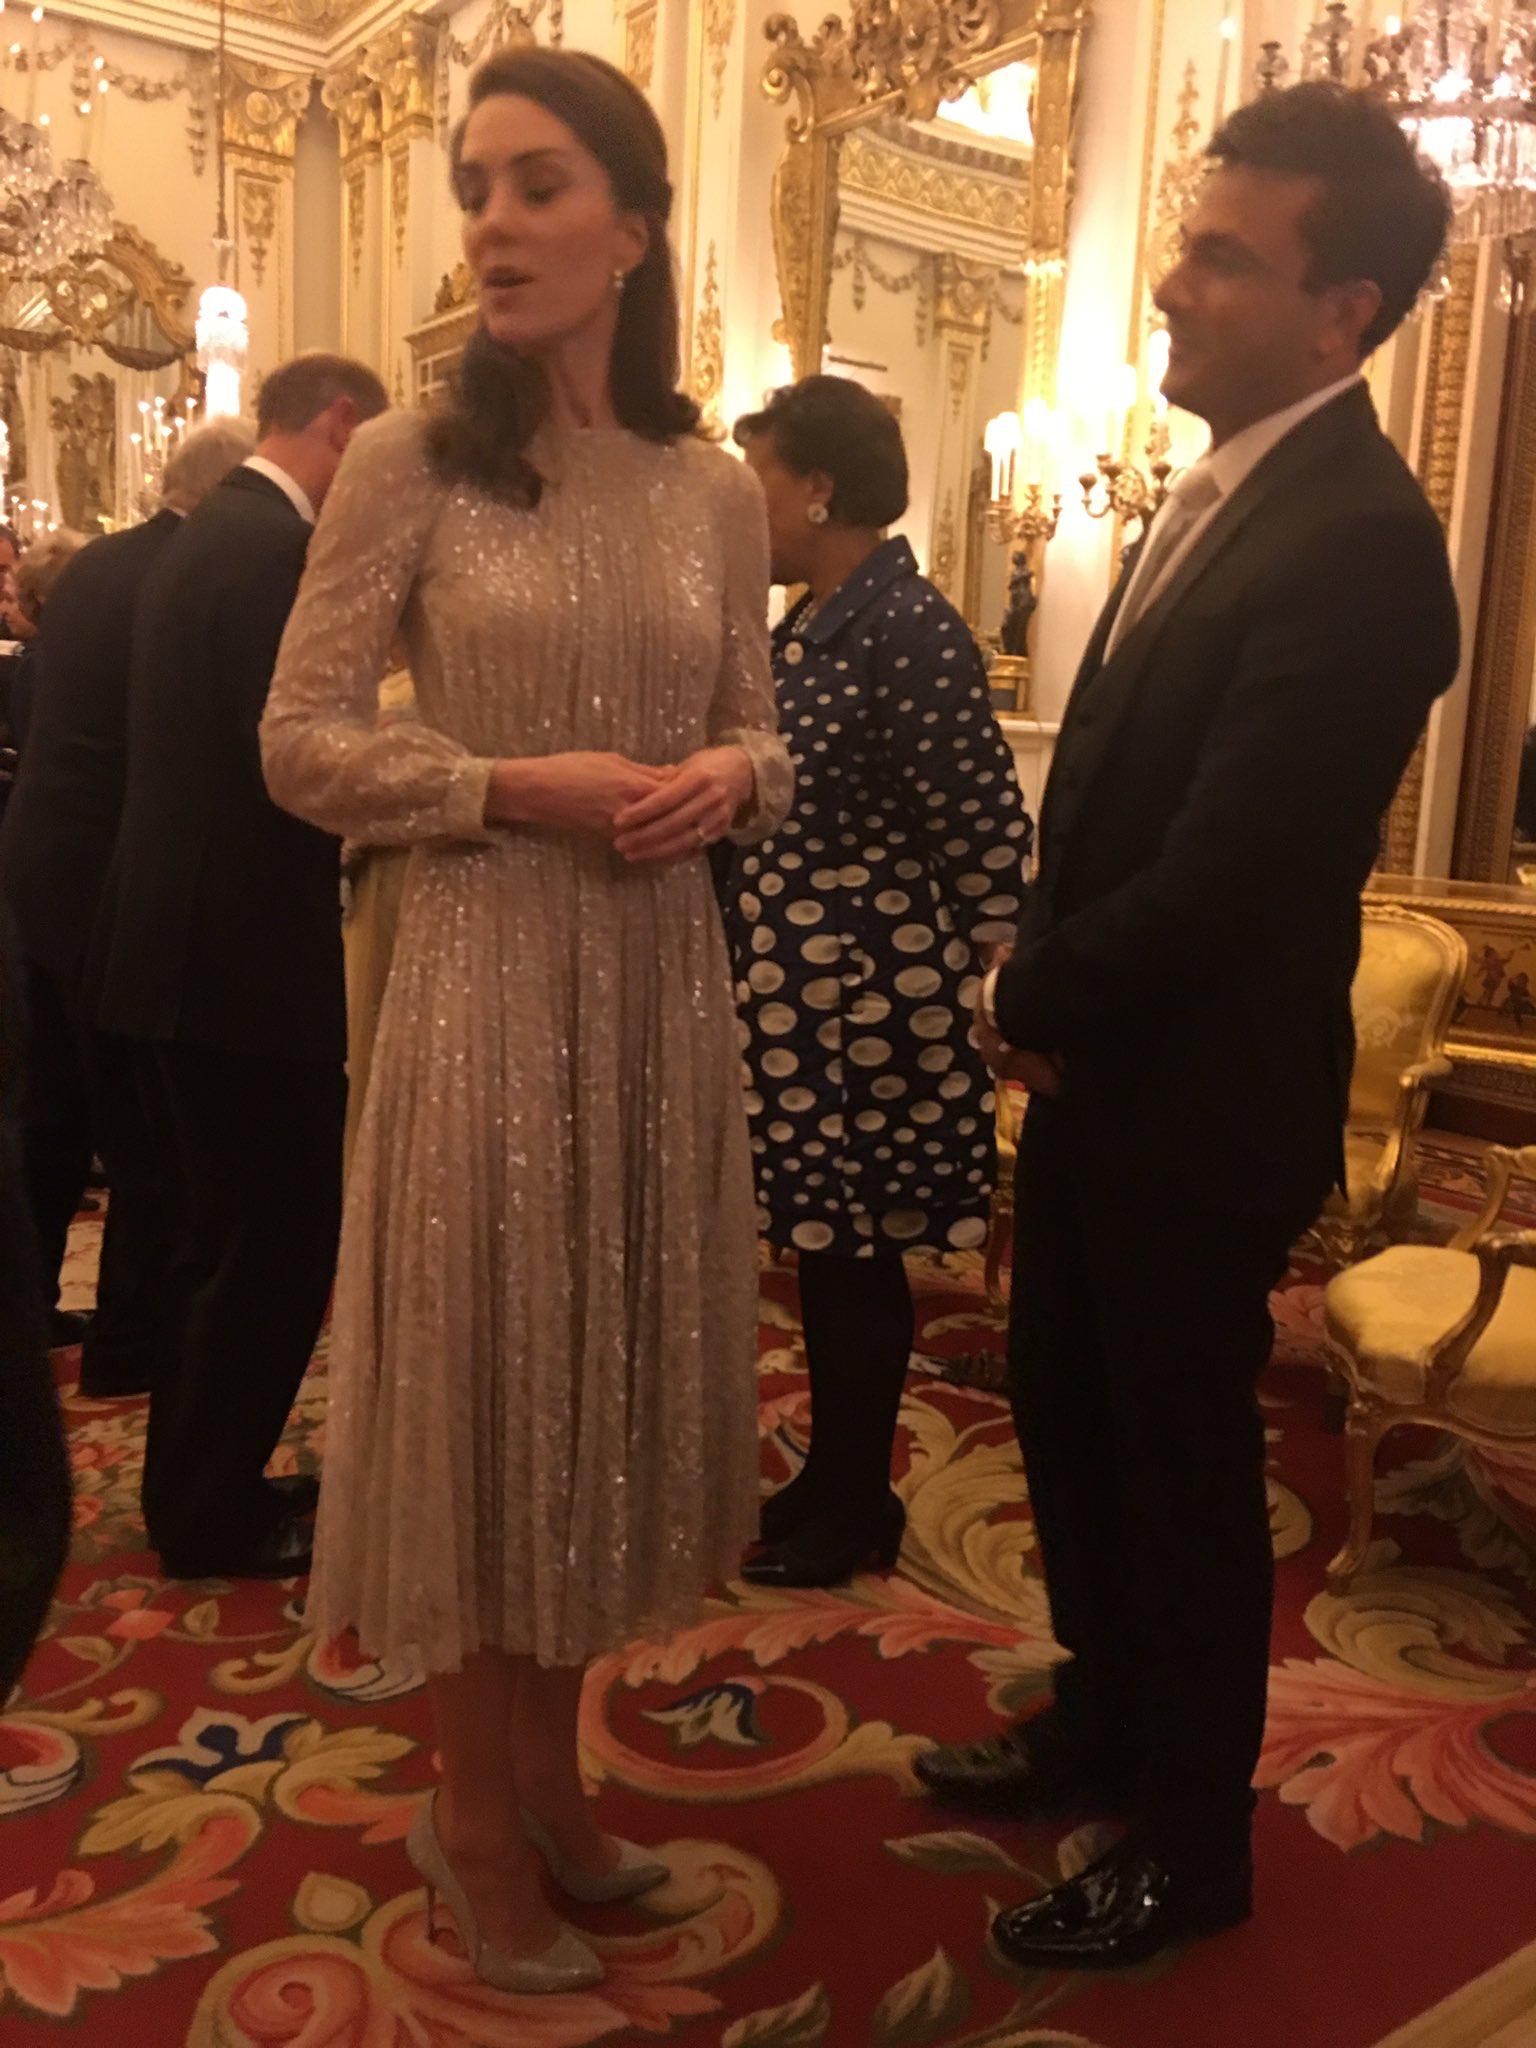 Pin De Jacki Frank Em Duchess Catherine Of Cambridge Realeza Nobreza Historia De Amor